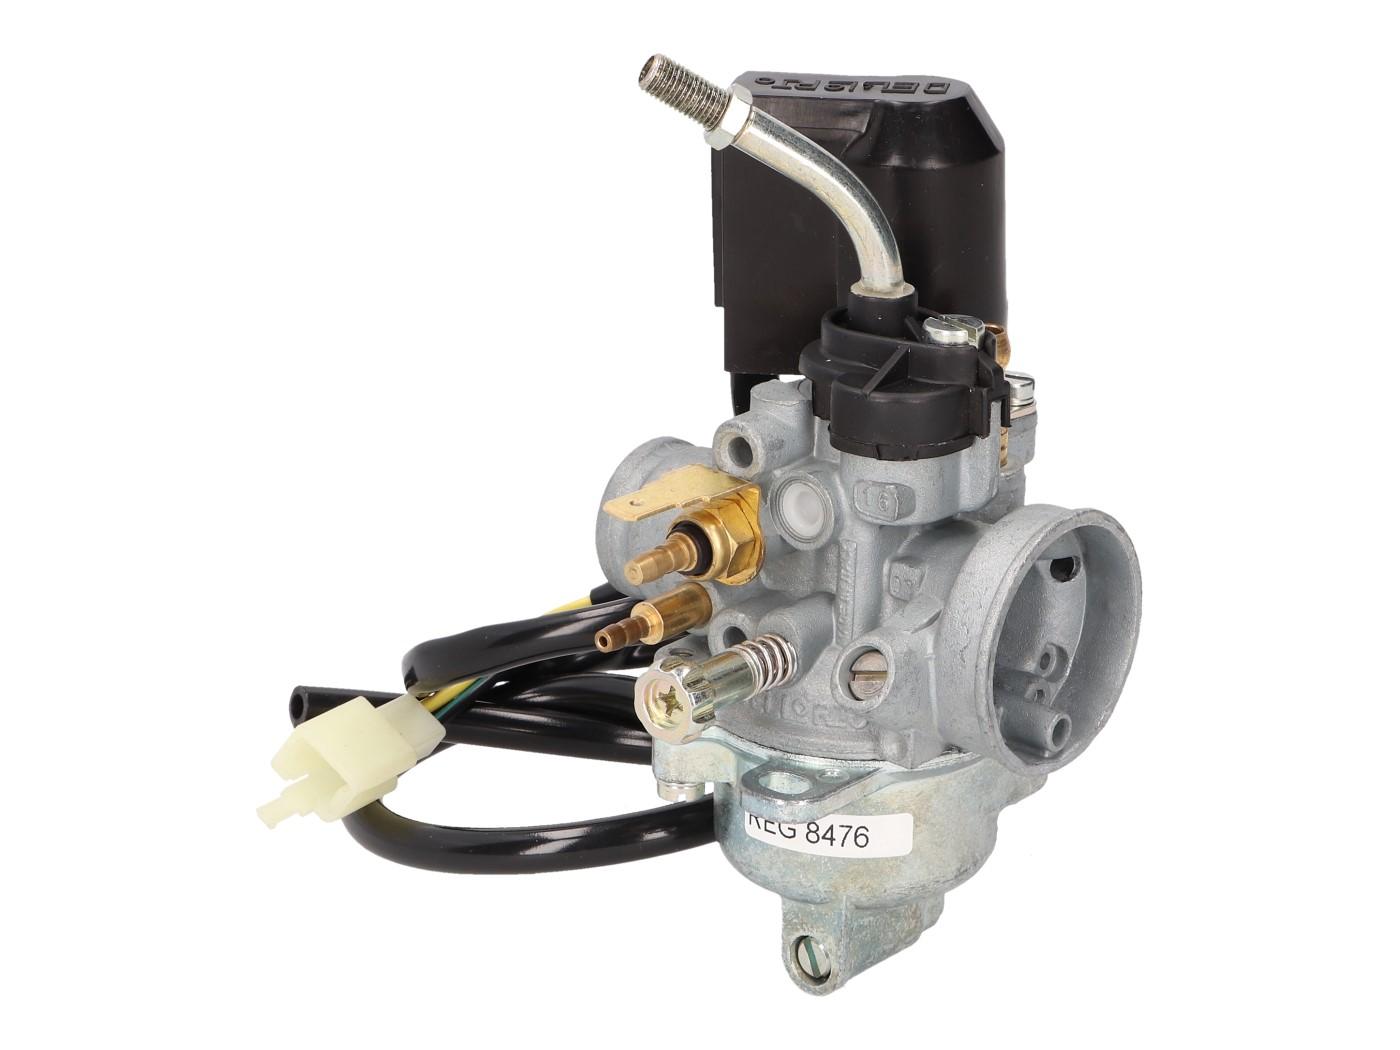 carburetor Dellorto PHVA 16 QS w e-choke for CPI Supercross